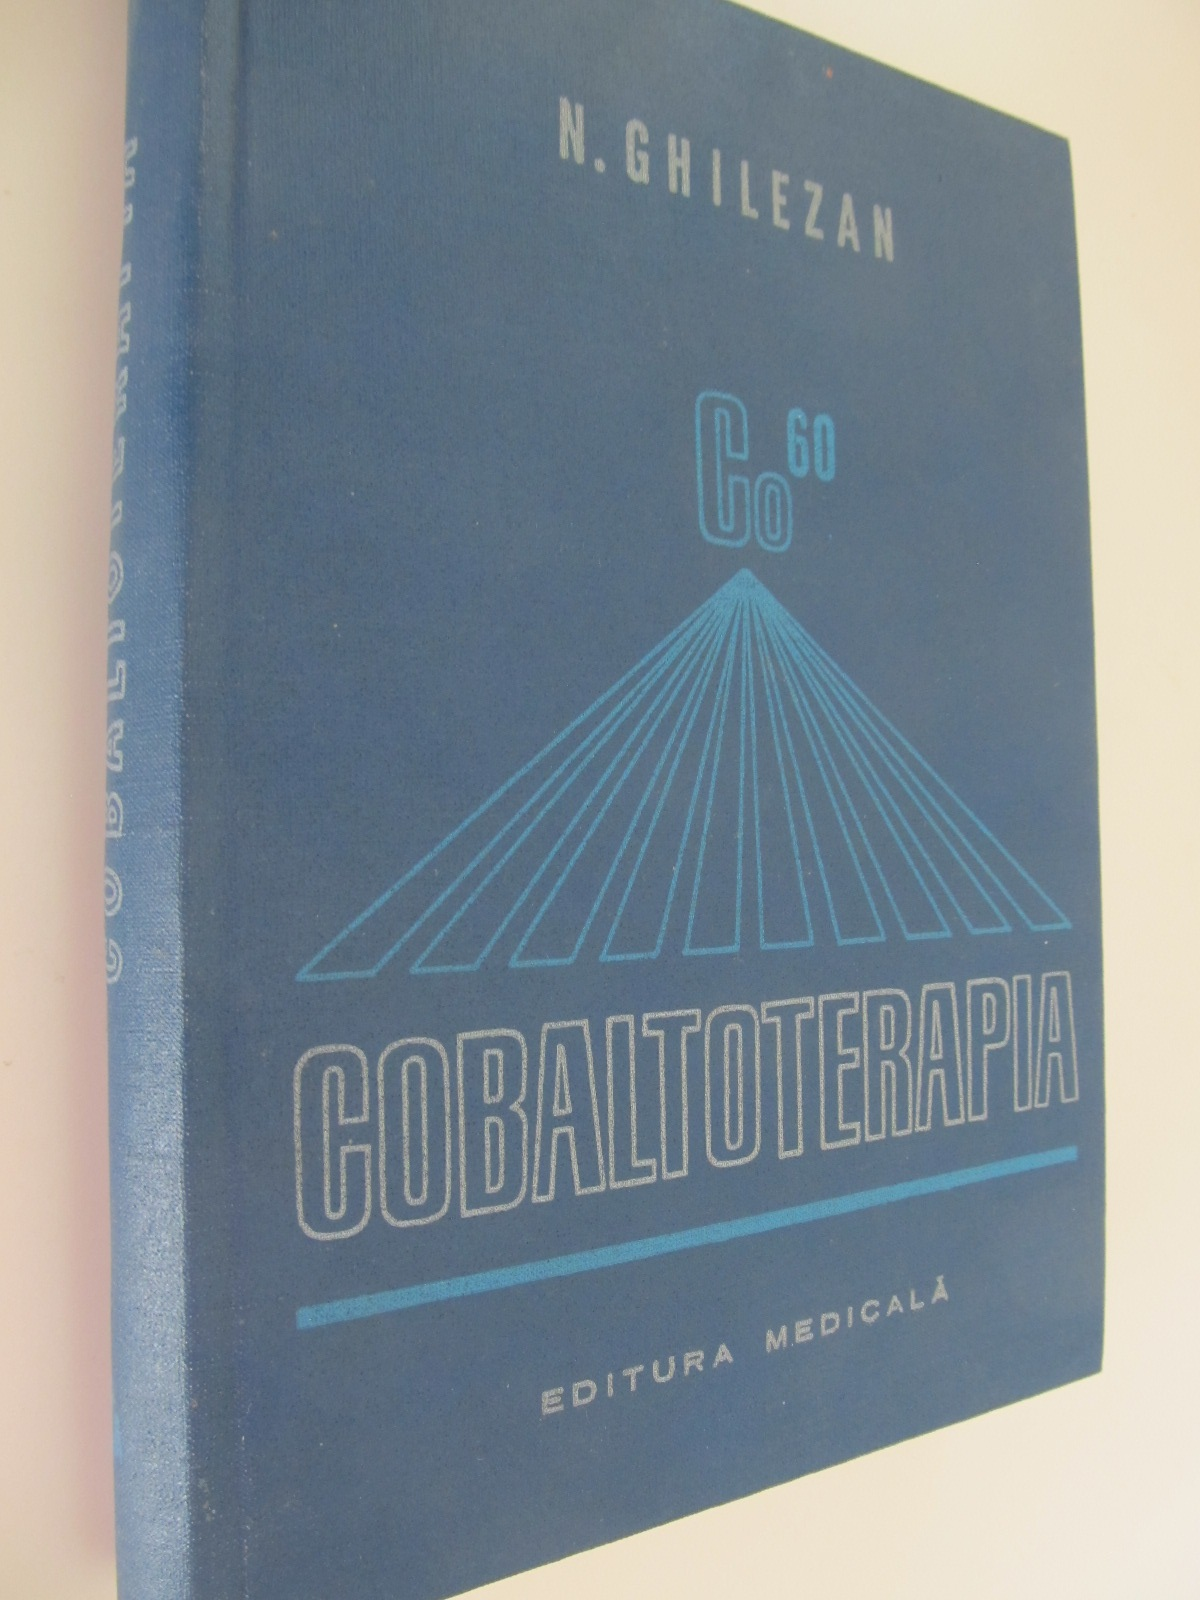 Cobaltoterapia - N. Ghilezan | Detalii carte